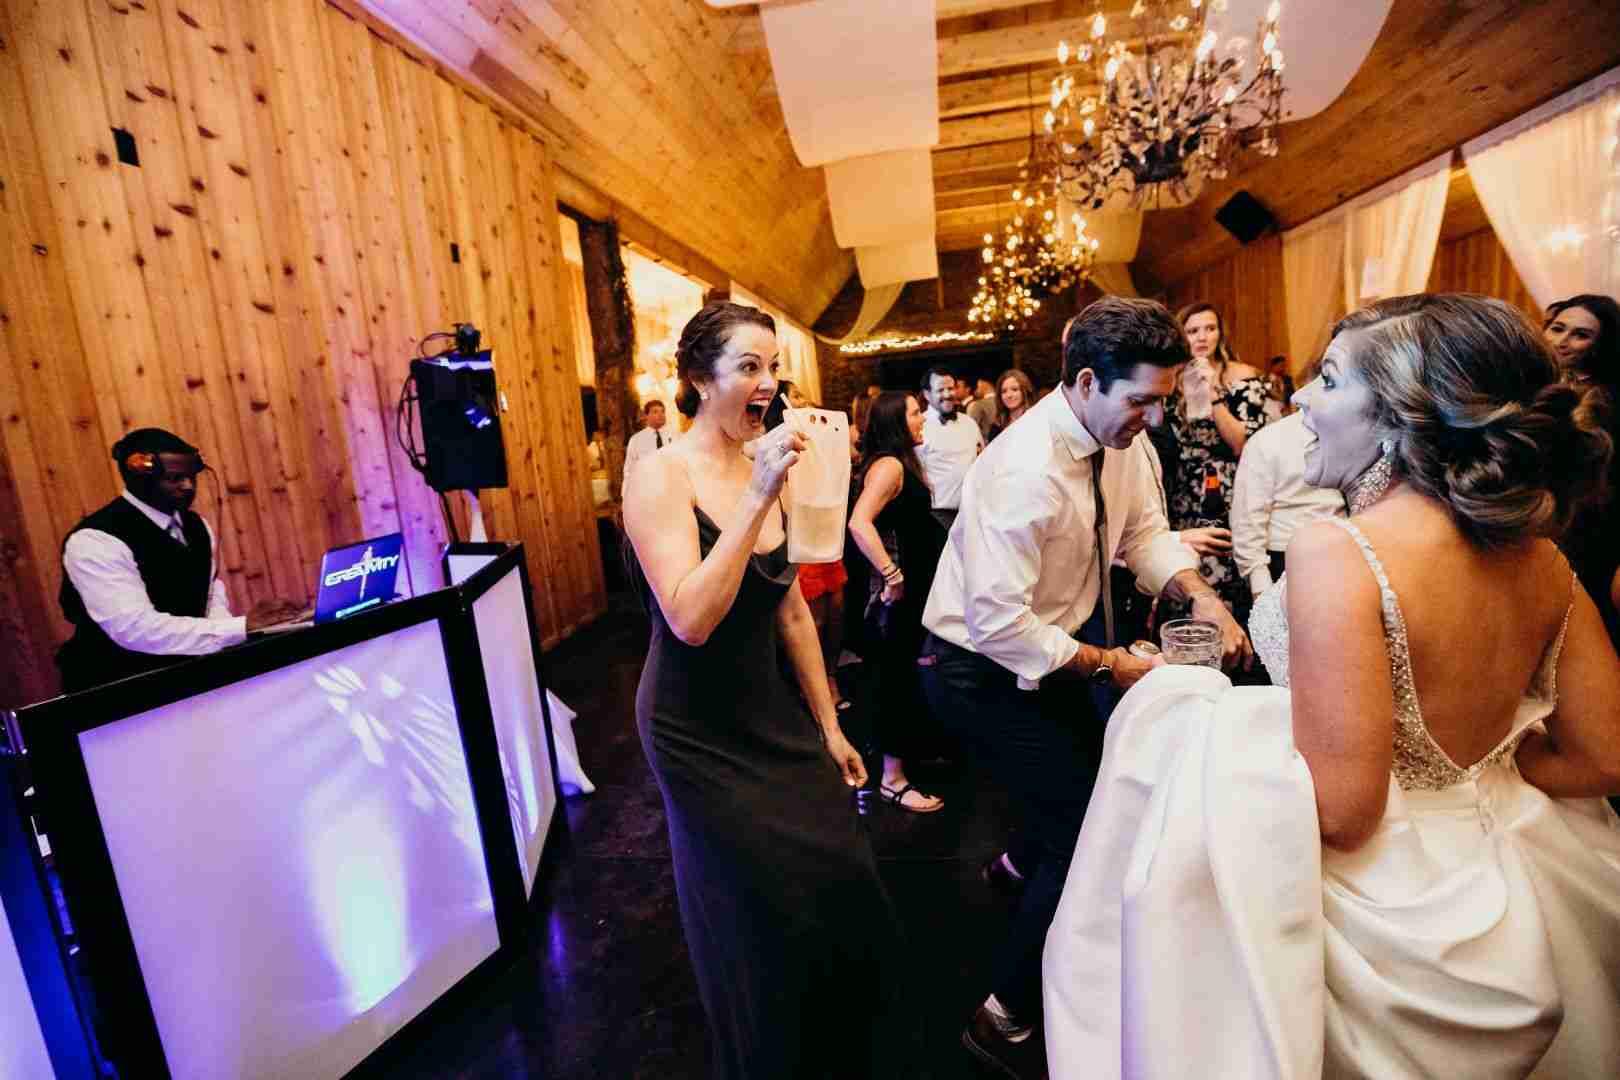 Winston-Salem NC DJs - Boss Playa Productions - Mobile DJ Service